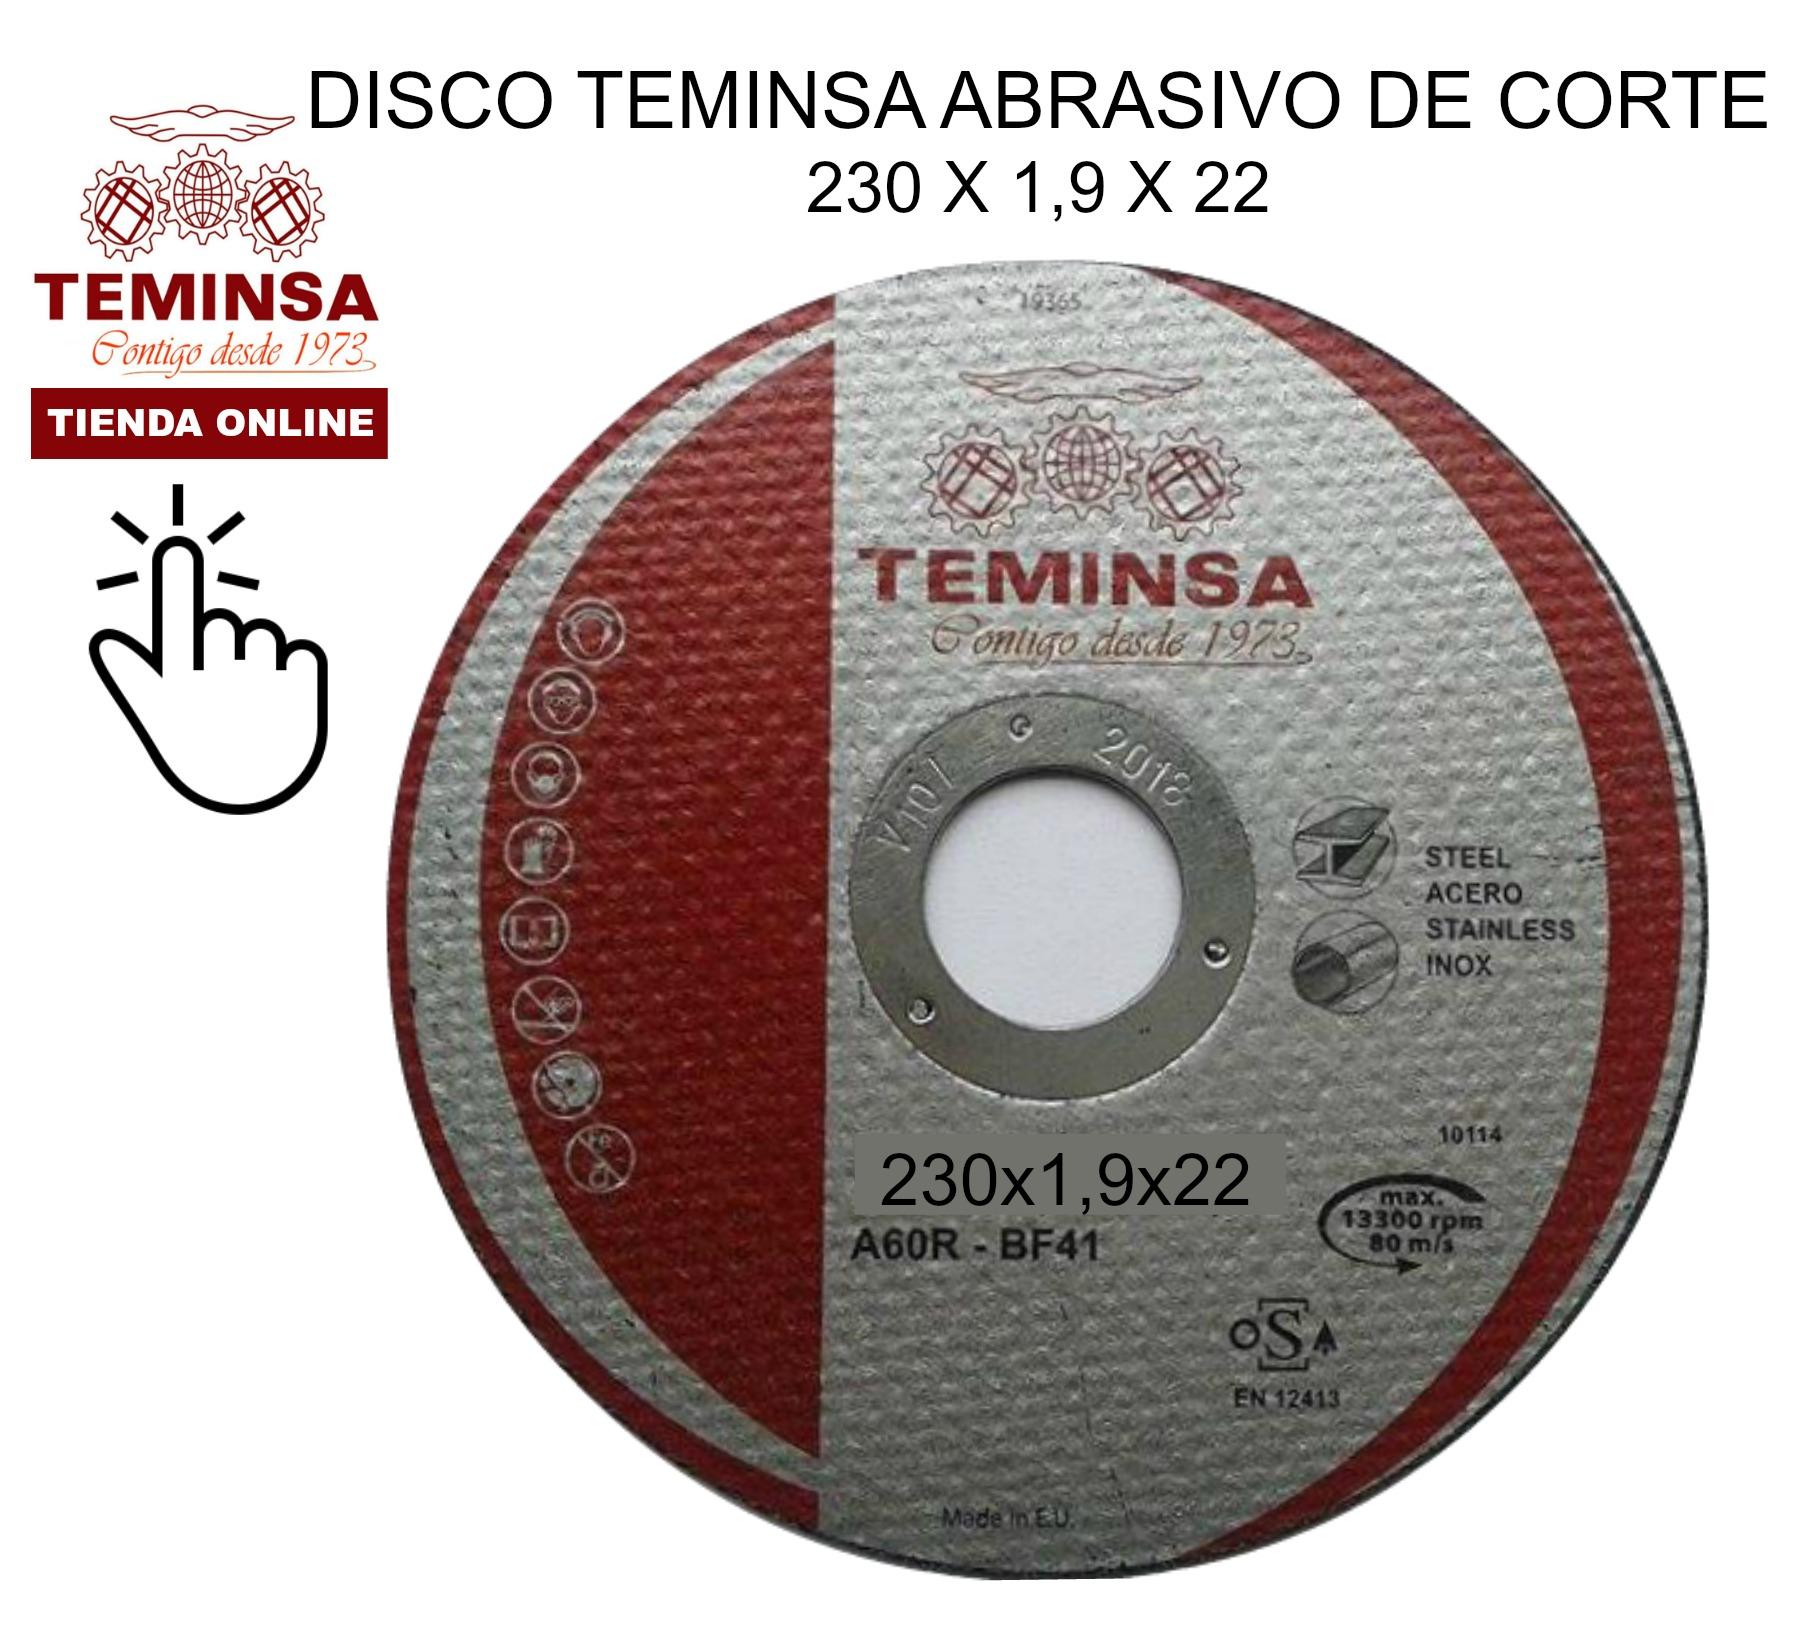 Disco Abrasivo de Corte Teminsa 230x1,9x22